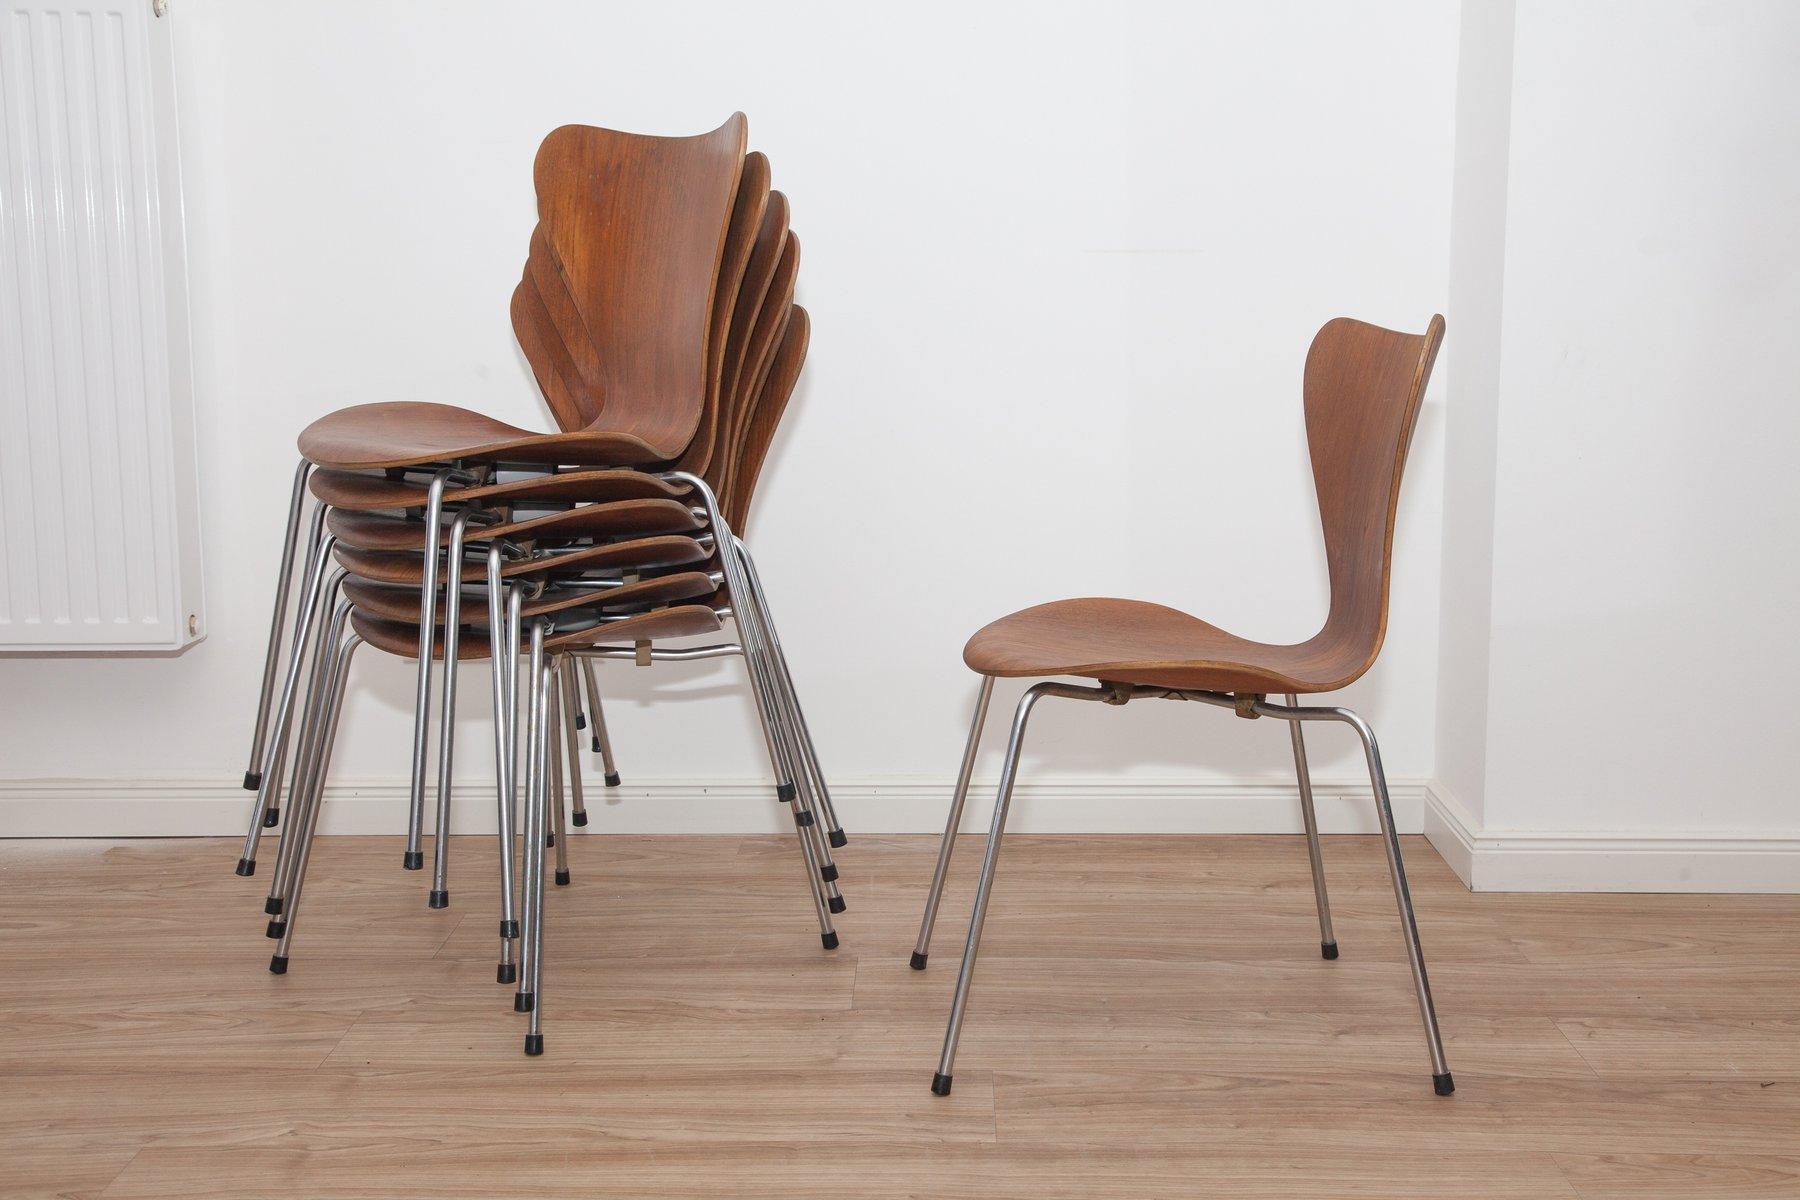 Jacobsen Stühle modell 3107 teak schichtholz ant stühle arne jacobsen für fritz hansen 1960er 7er set